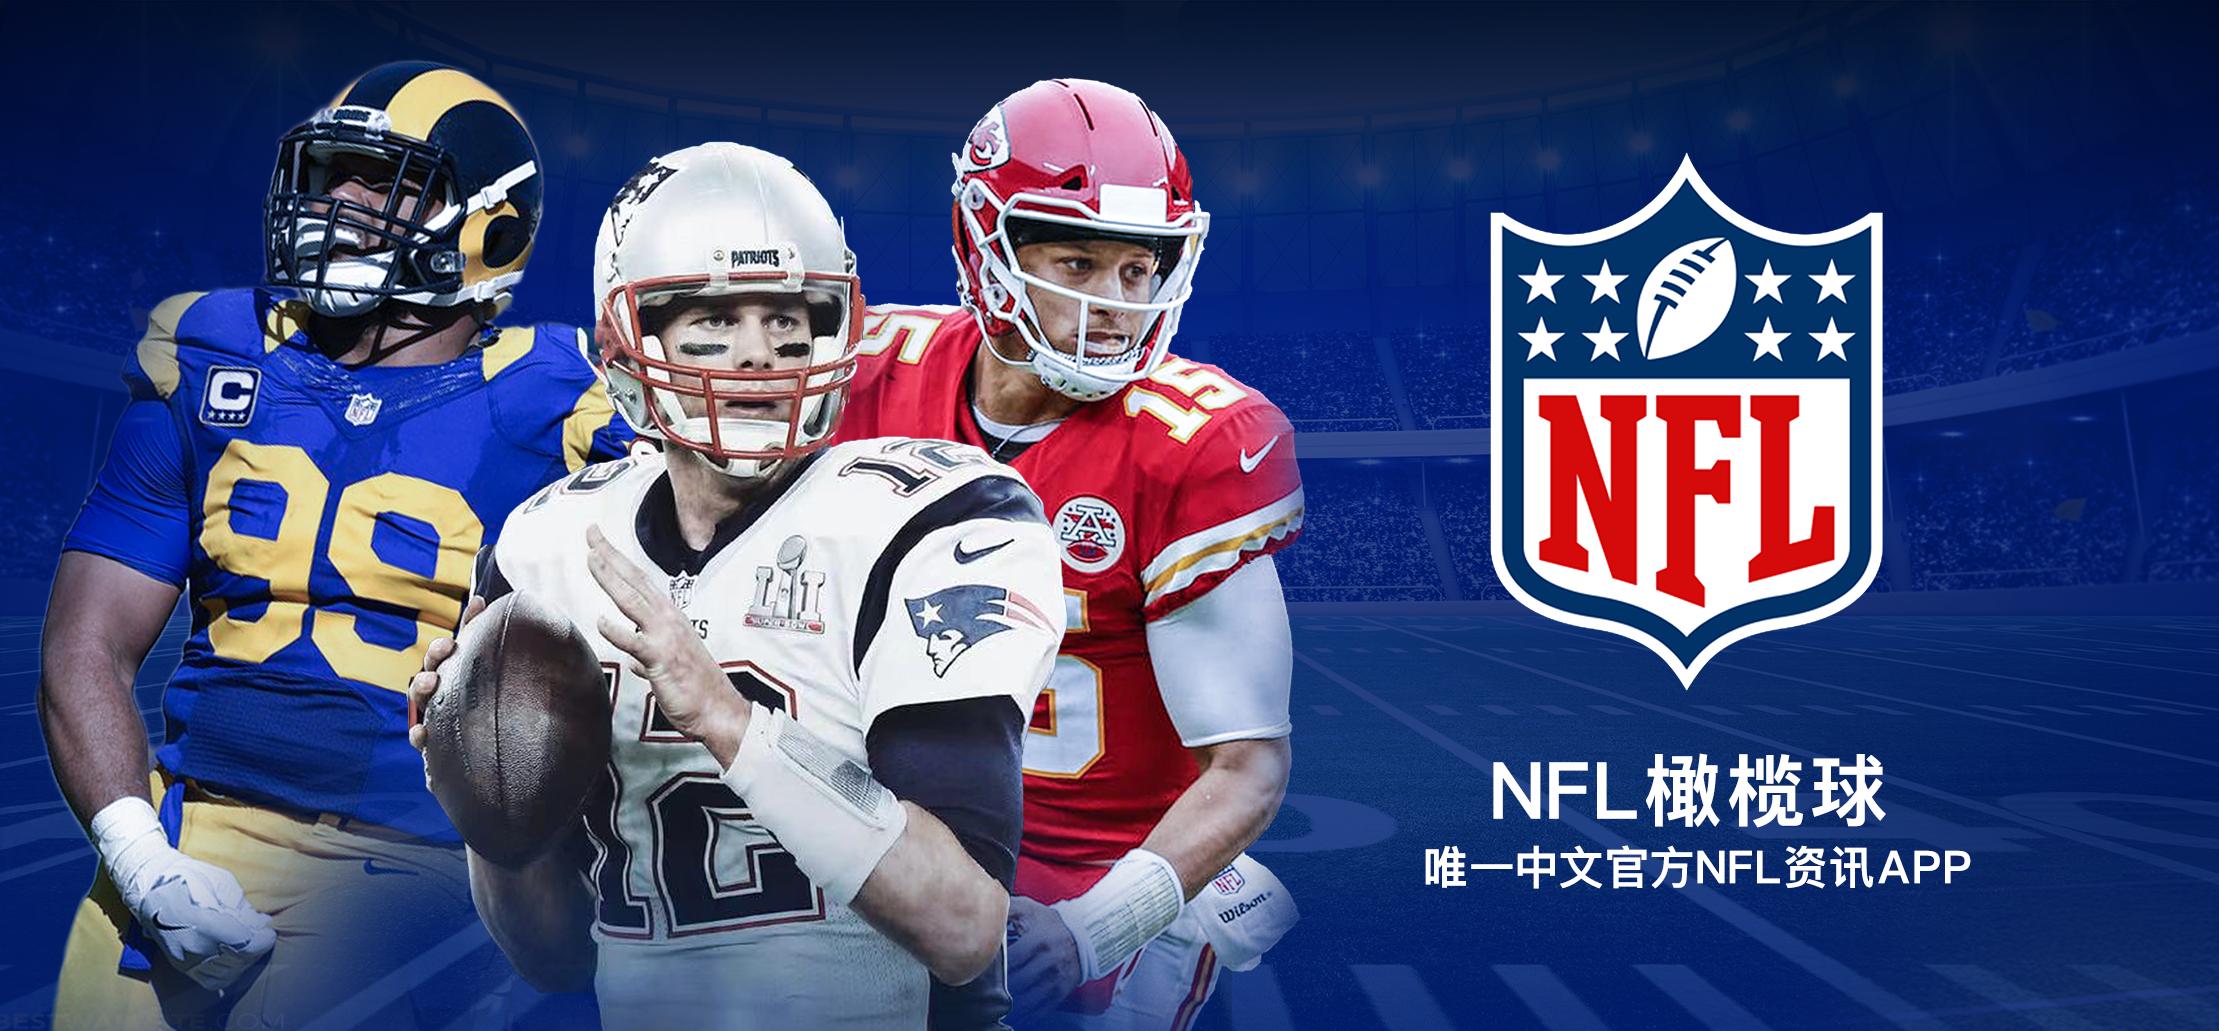 NFL橄榄球APP更新公告